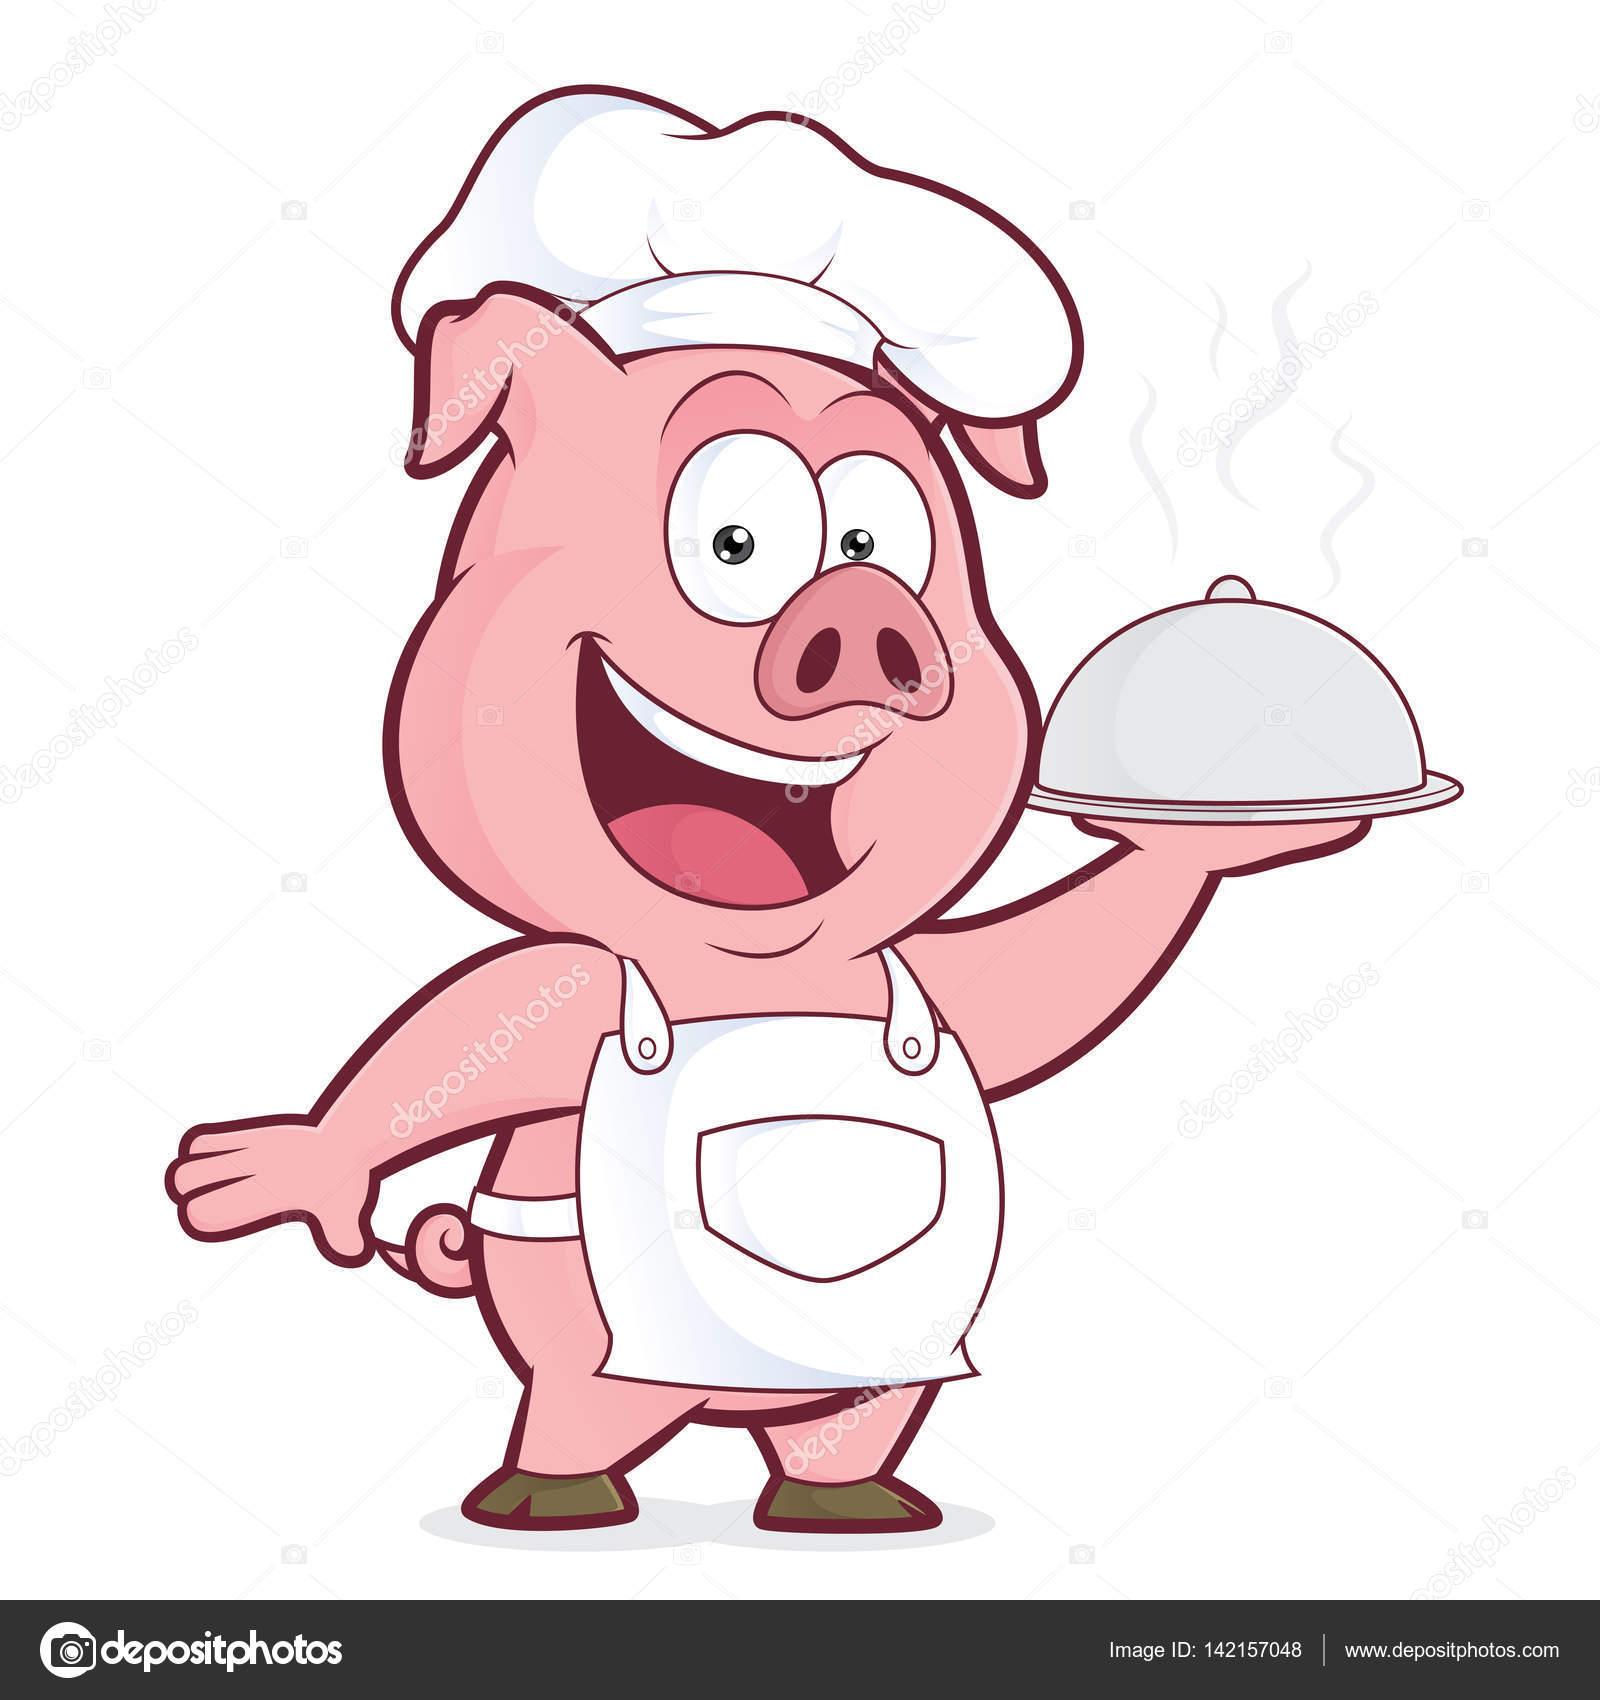 Koch bei der arbeit clipart  Schwein Koch Holding silberne cloche — Stockvektor © sundatoon ...